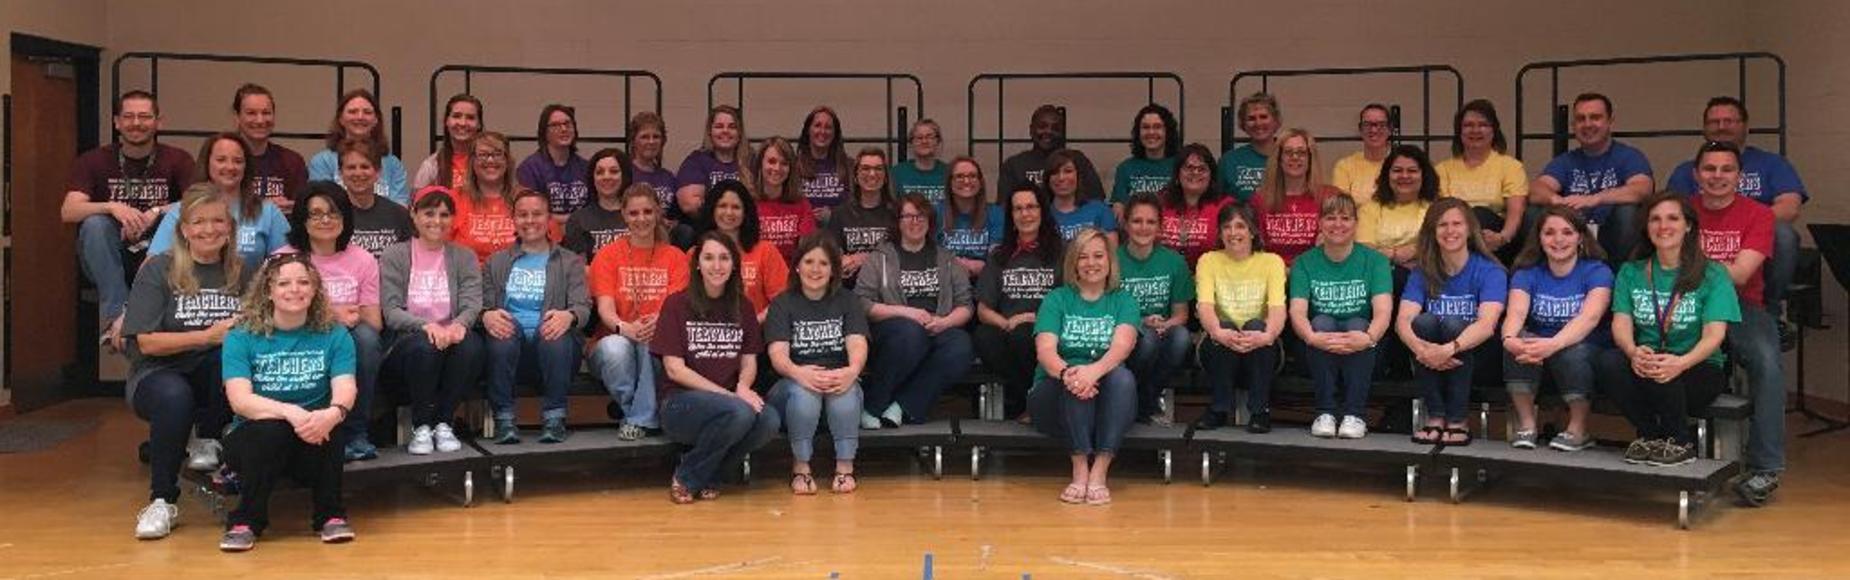 2016-2017 Teachers Picture